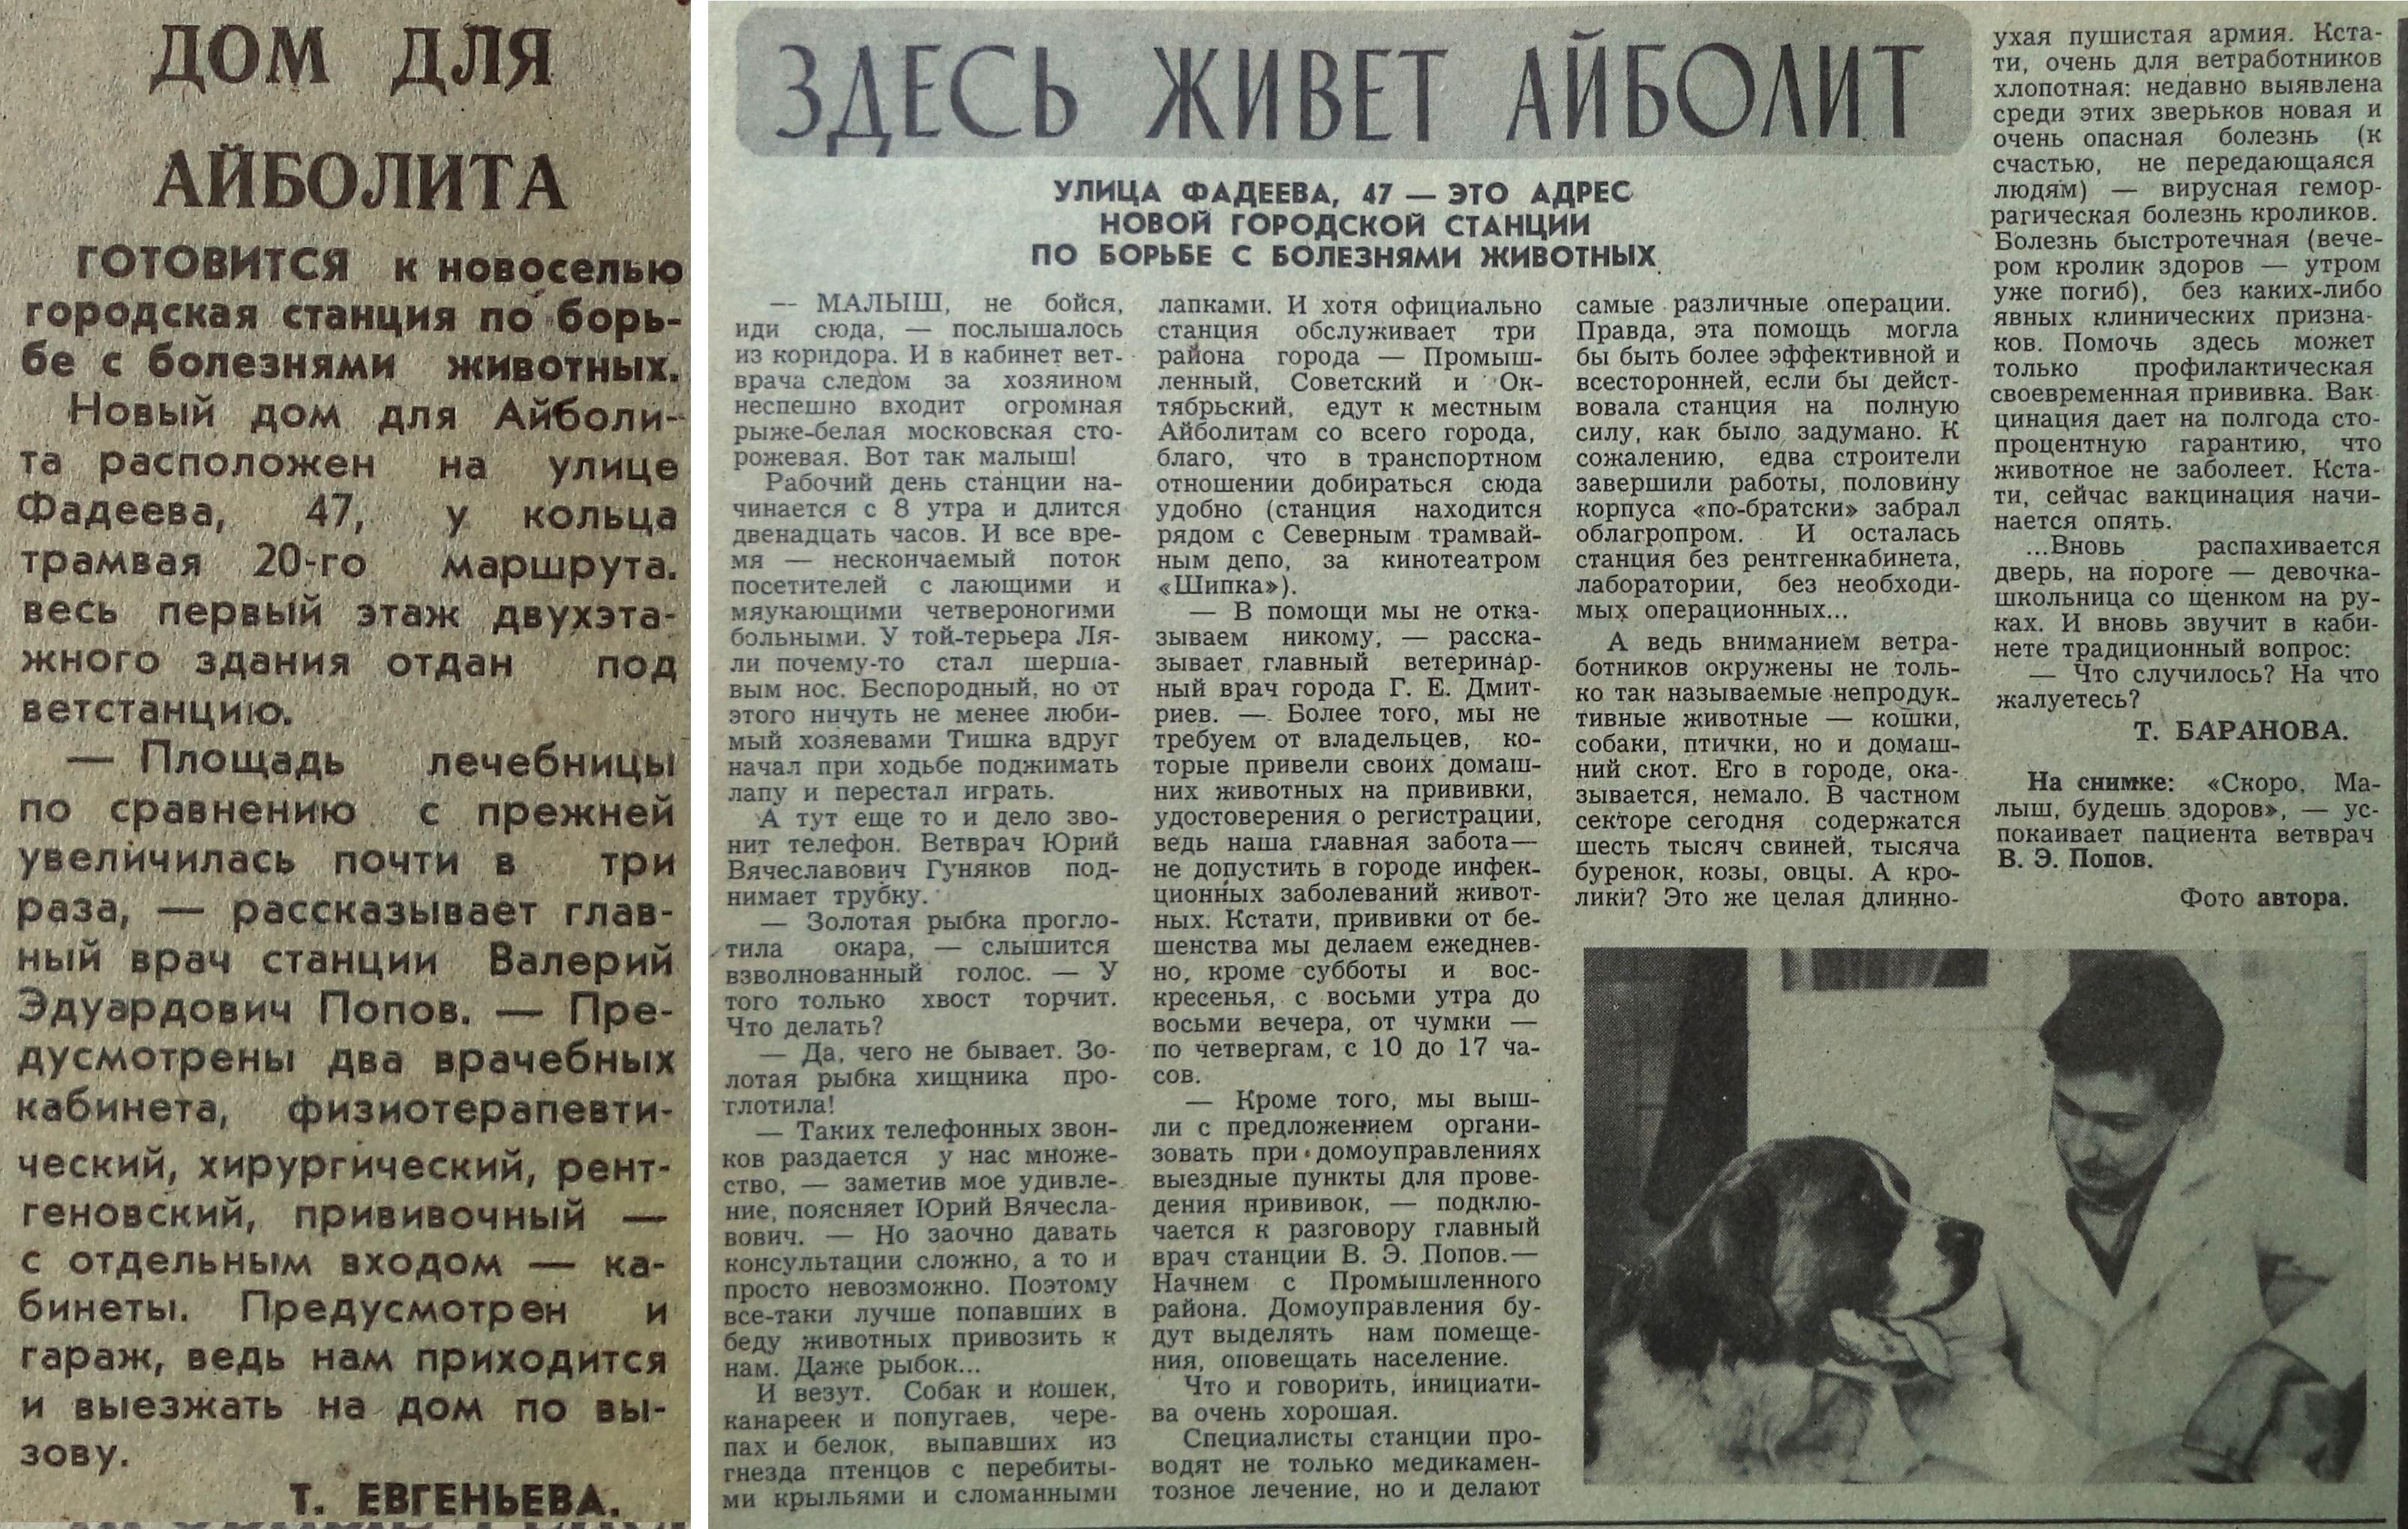 Фадеева-ФОТО-22-ВЗя-1987-07-30-горветлечебница на Фадеева